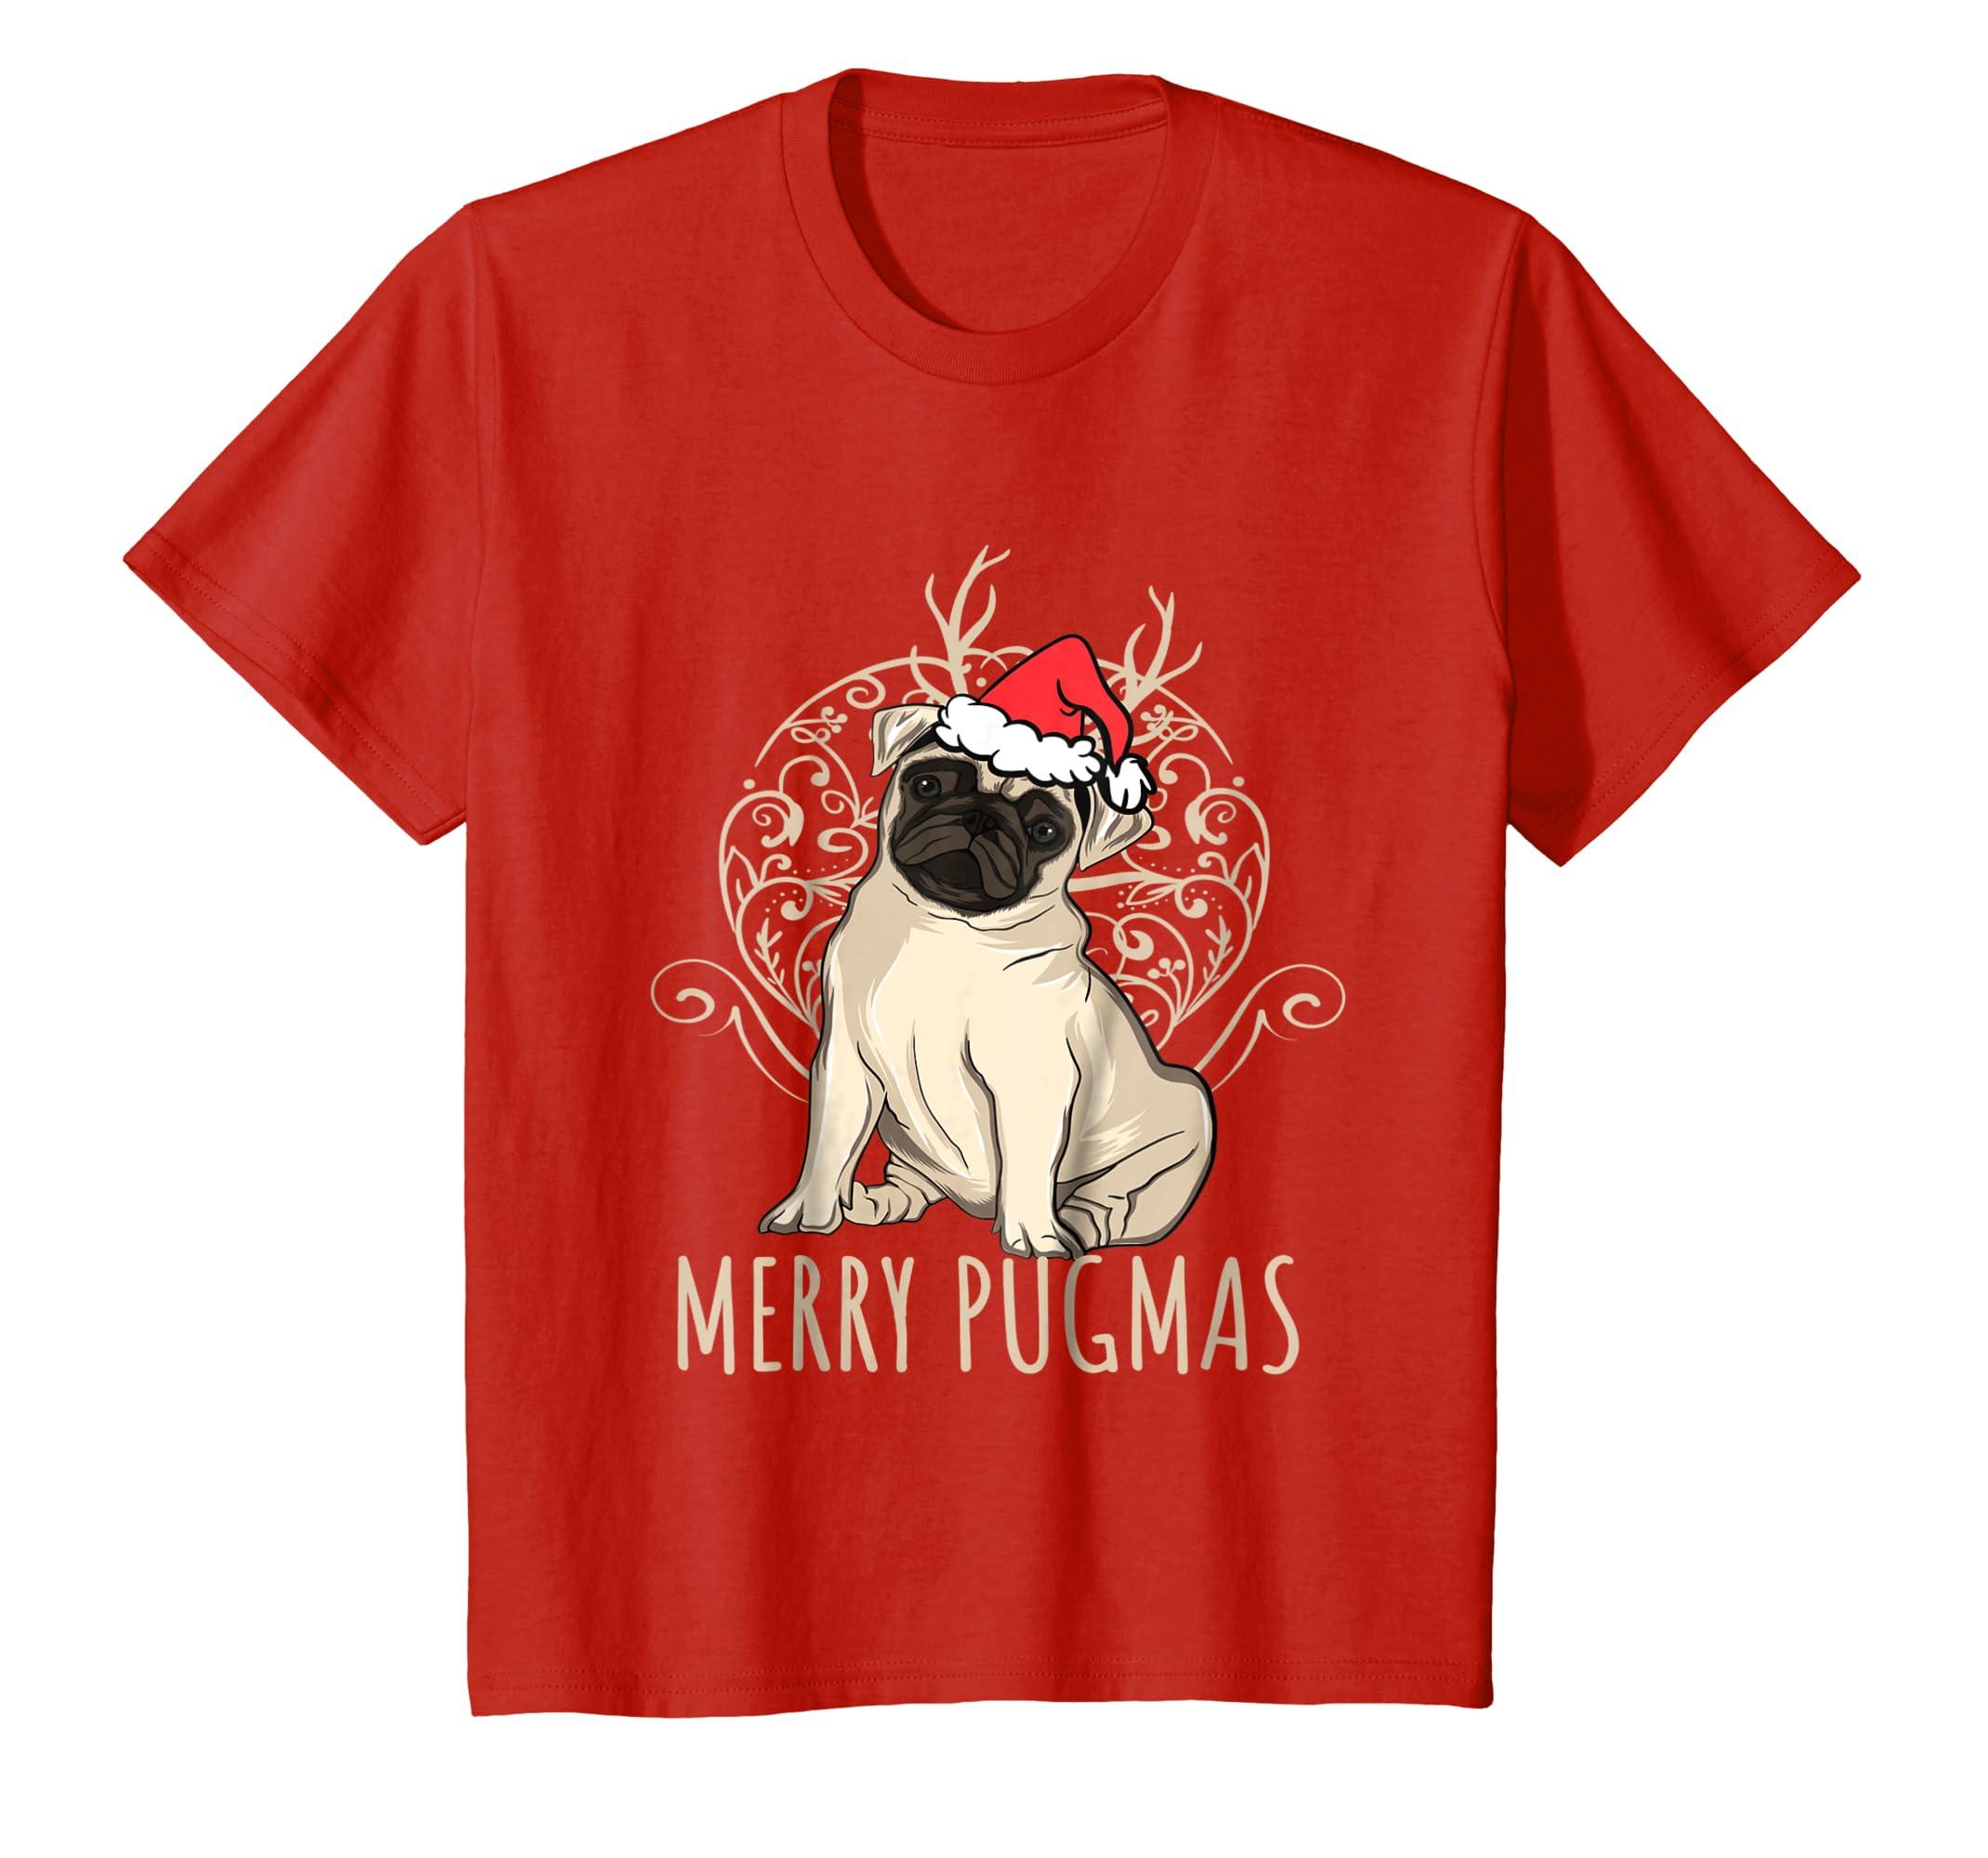 d4192654 Amazon.com: Merry Pugmas Funny Pug Christmas TShirt: Clothing